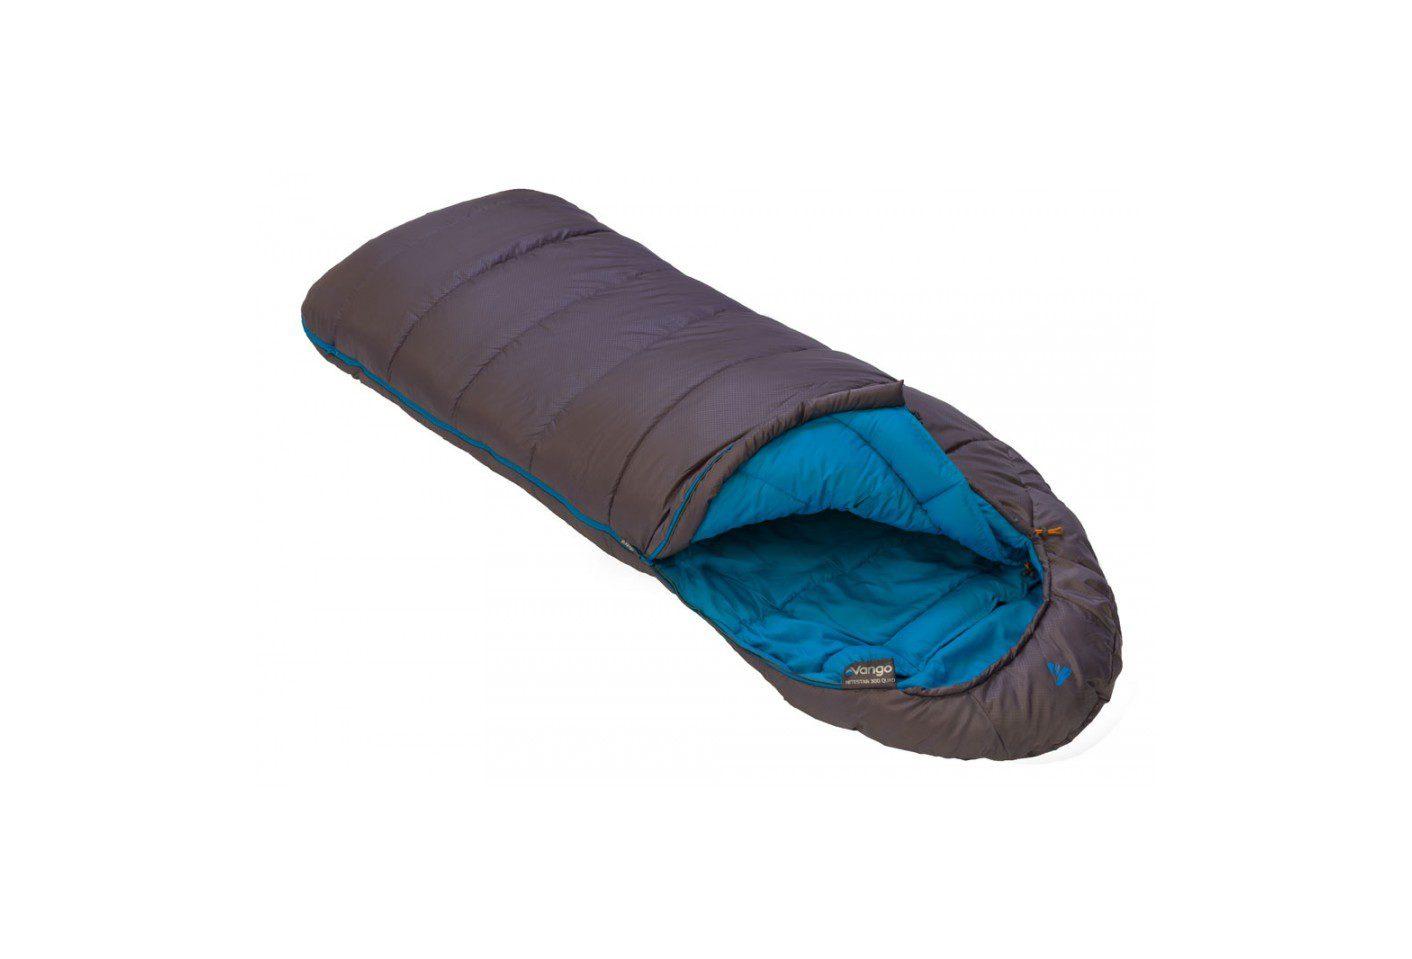 Vango Nitestar 300 Quad sleeping bag open - excalibur